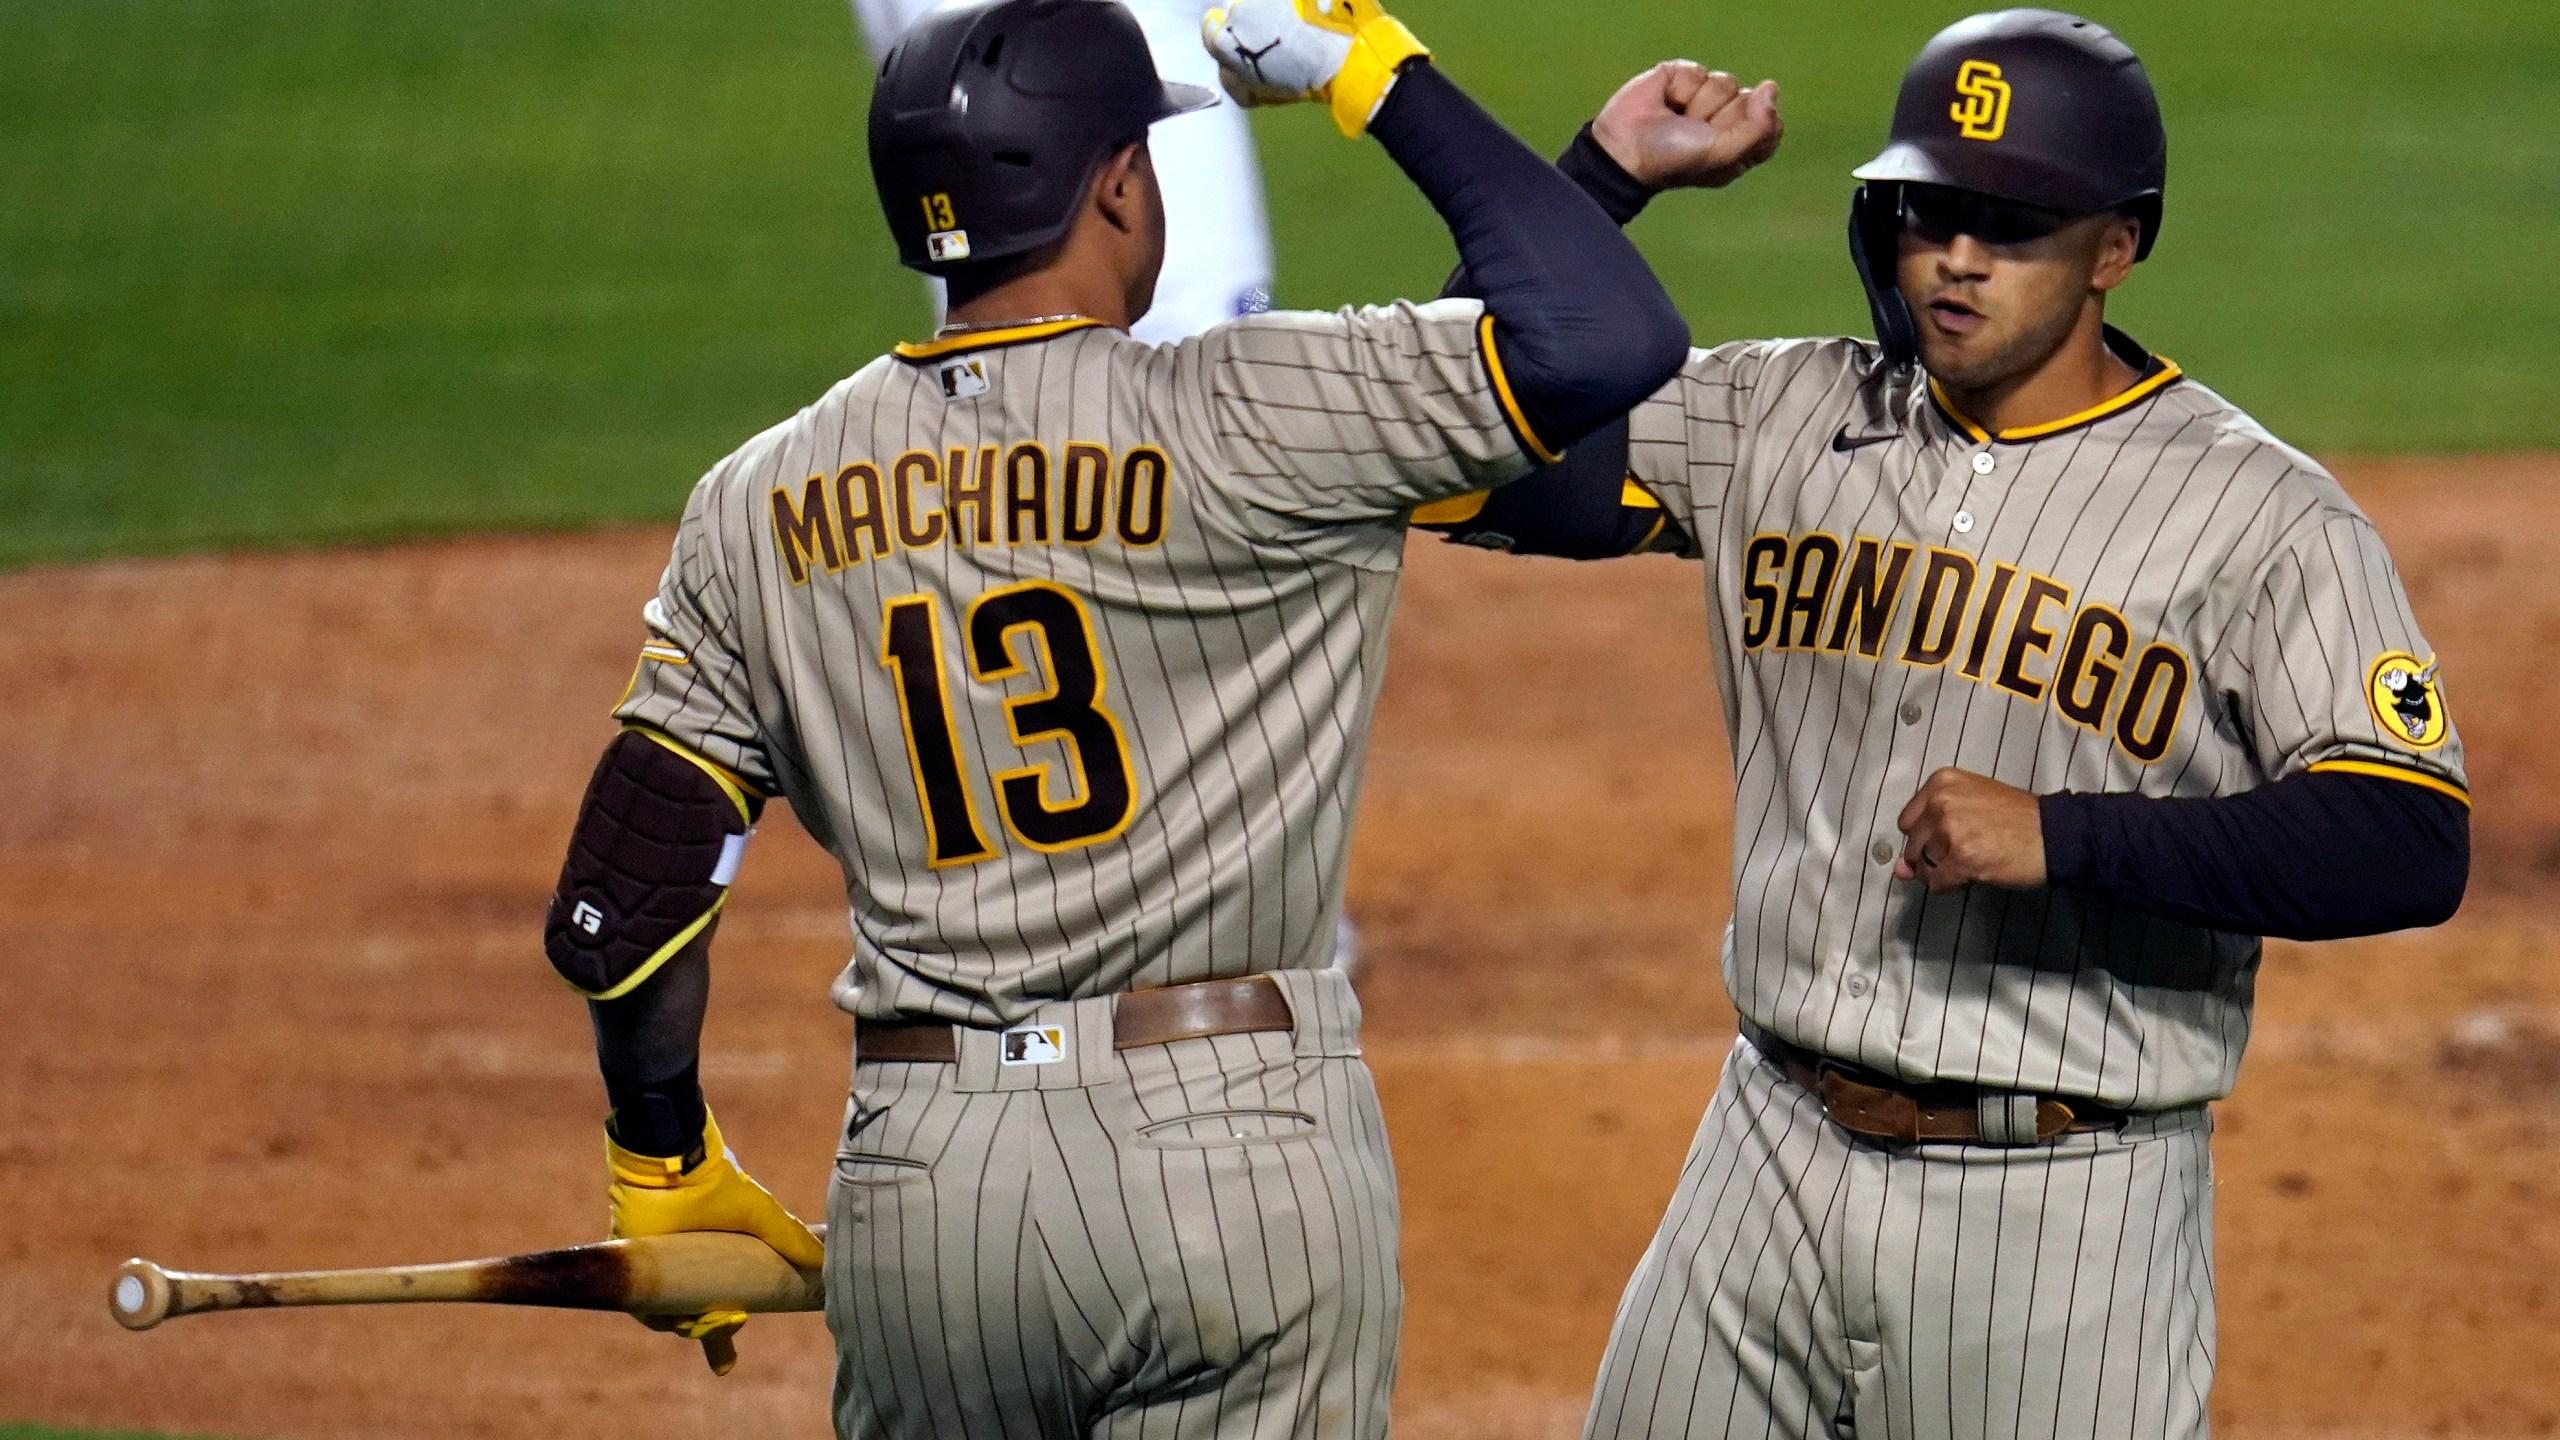 Trent Grisham, Manny Machado